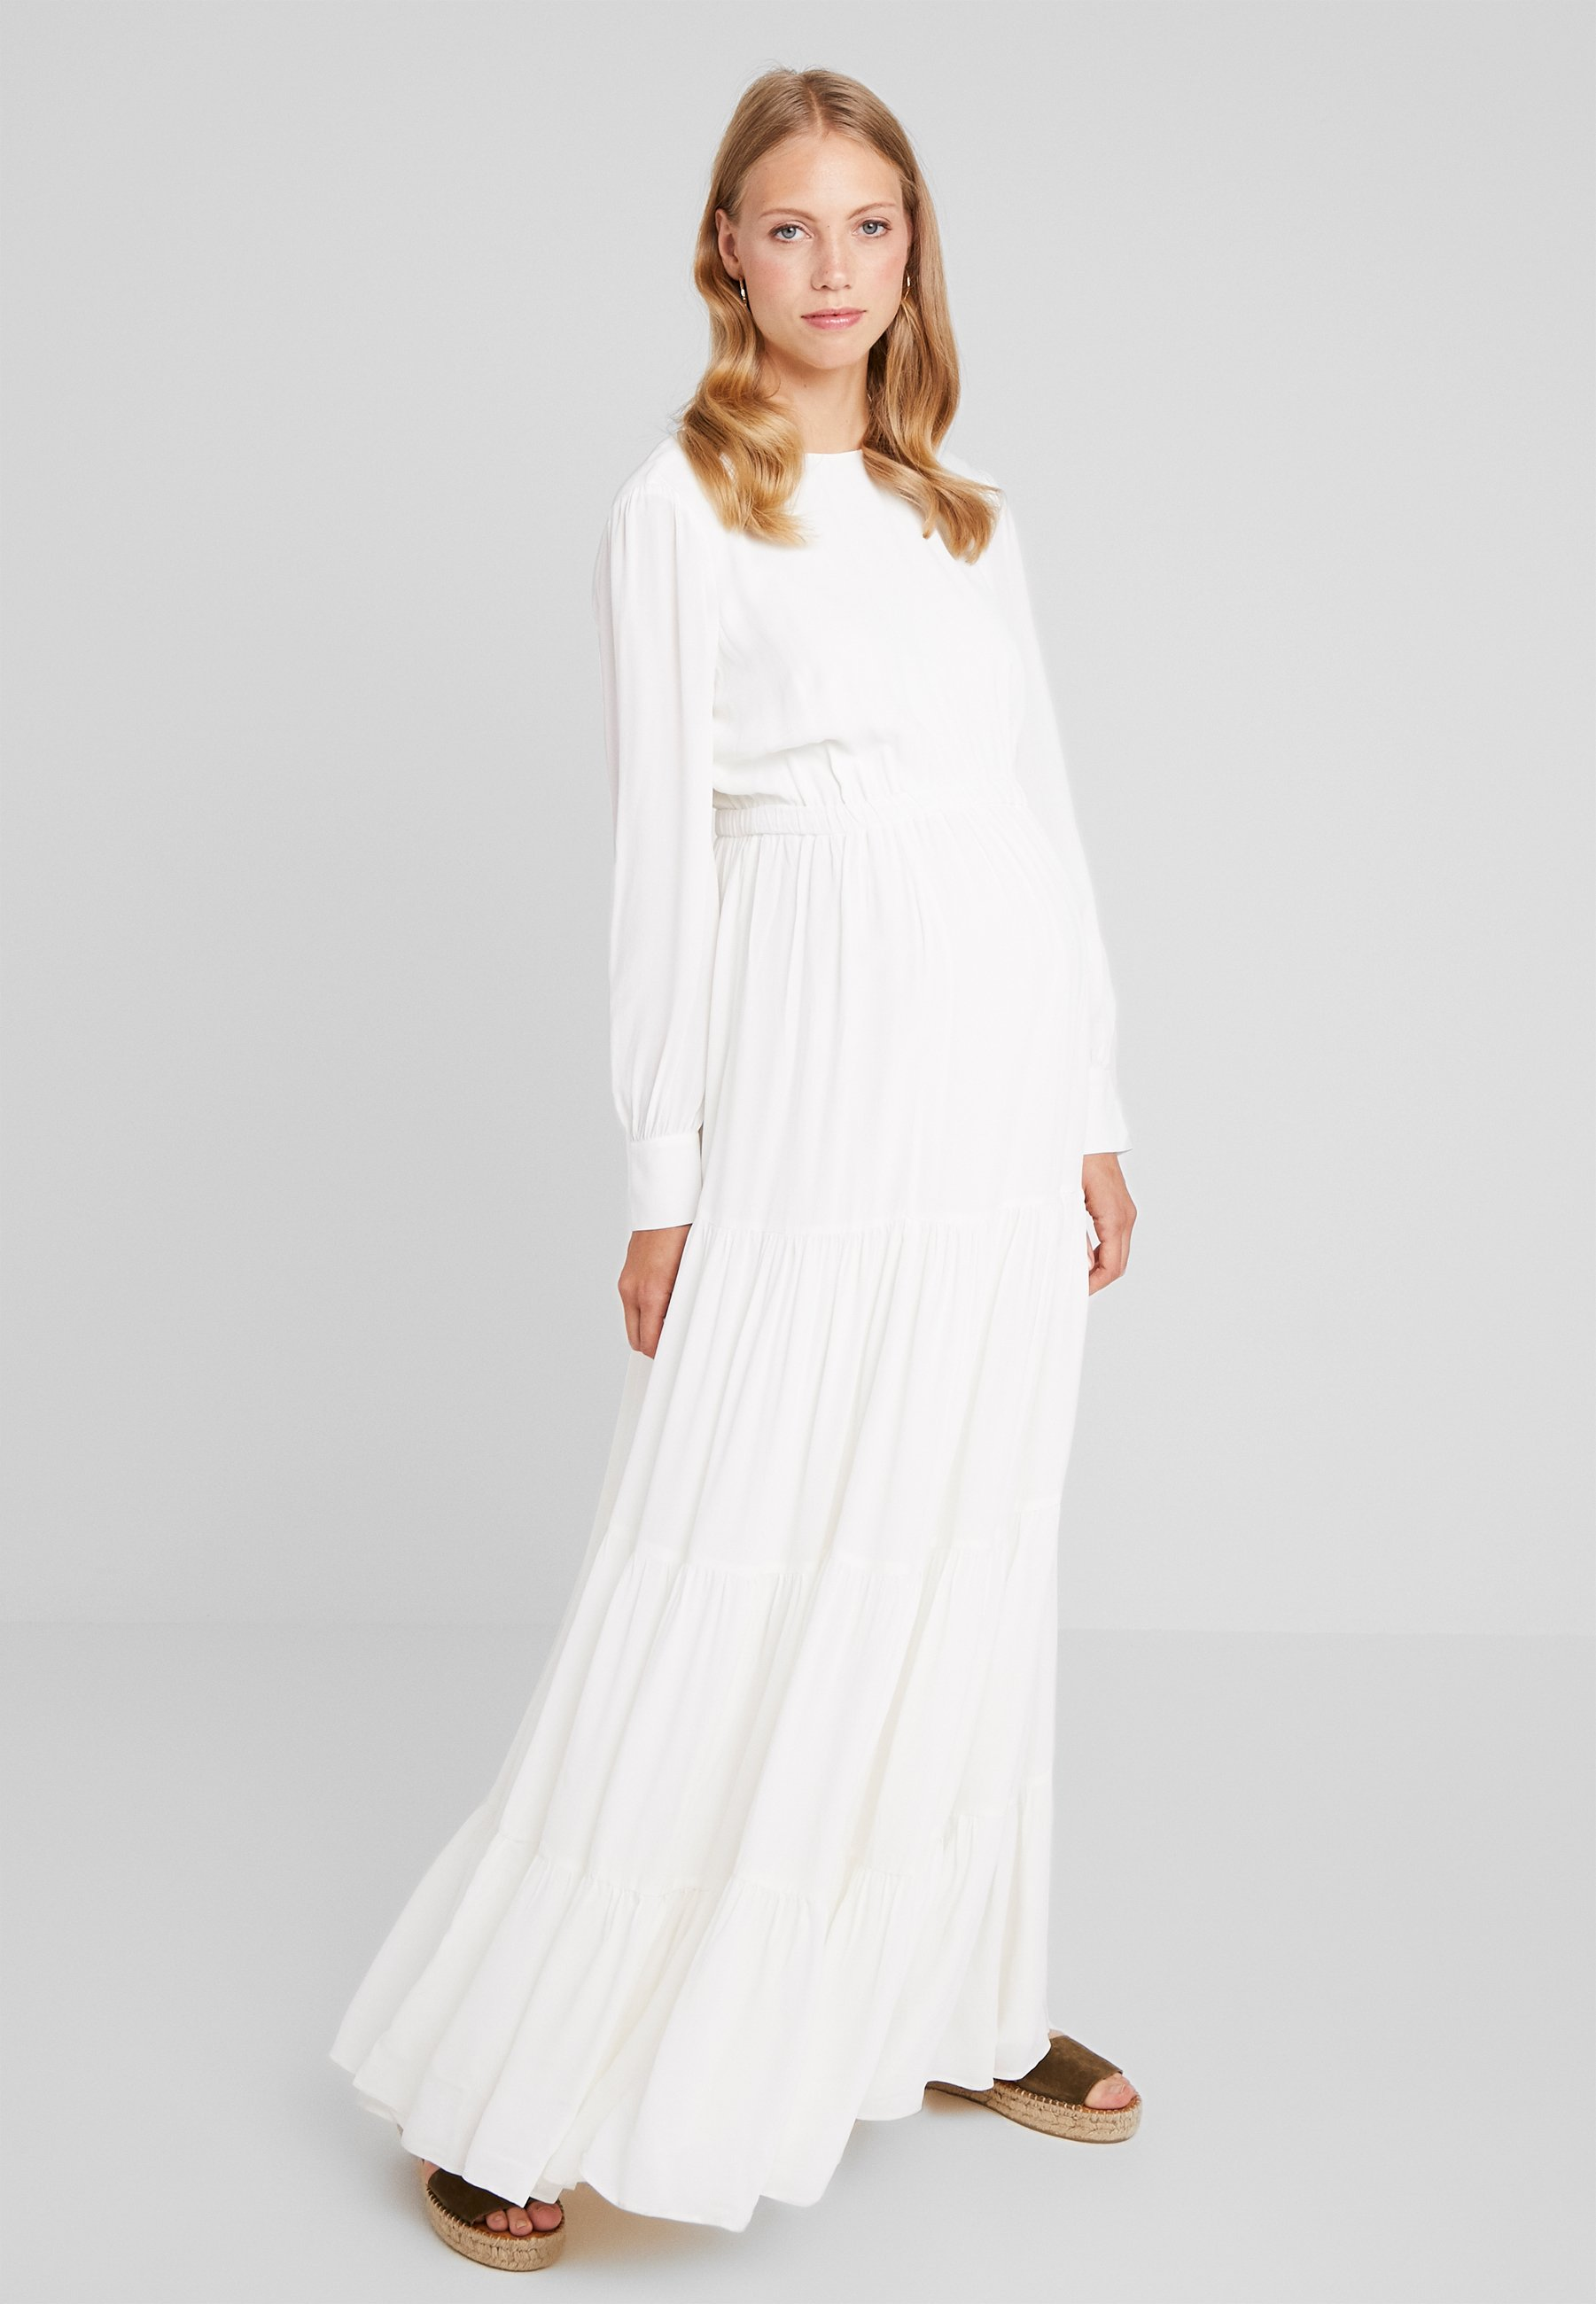 Oak Ivyamp; White Dress Snow Maternity Bridal Longue MaxiRobe dCxBero